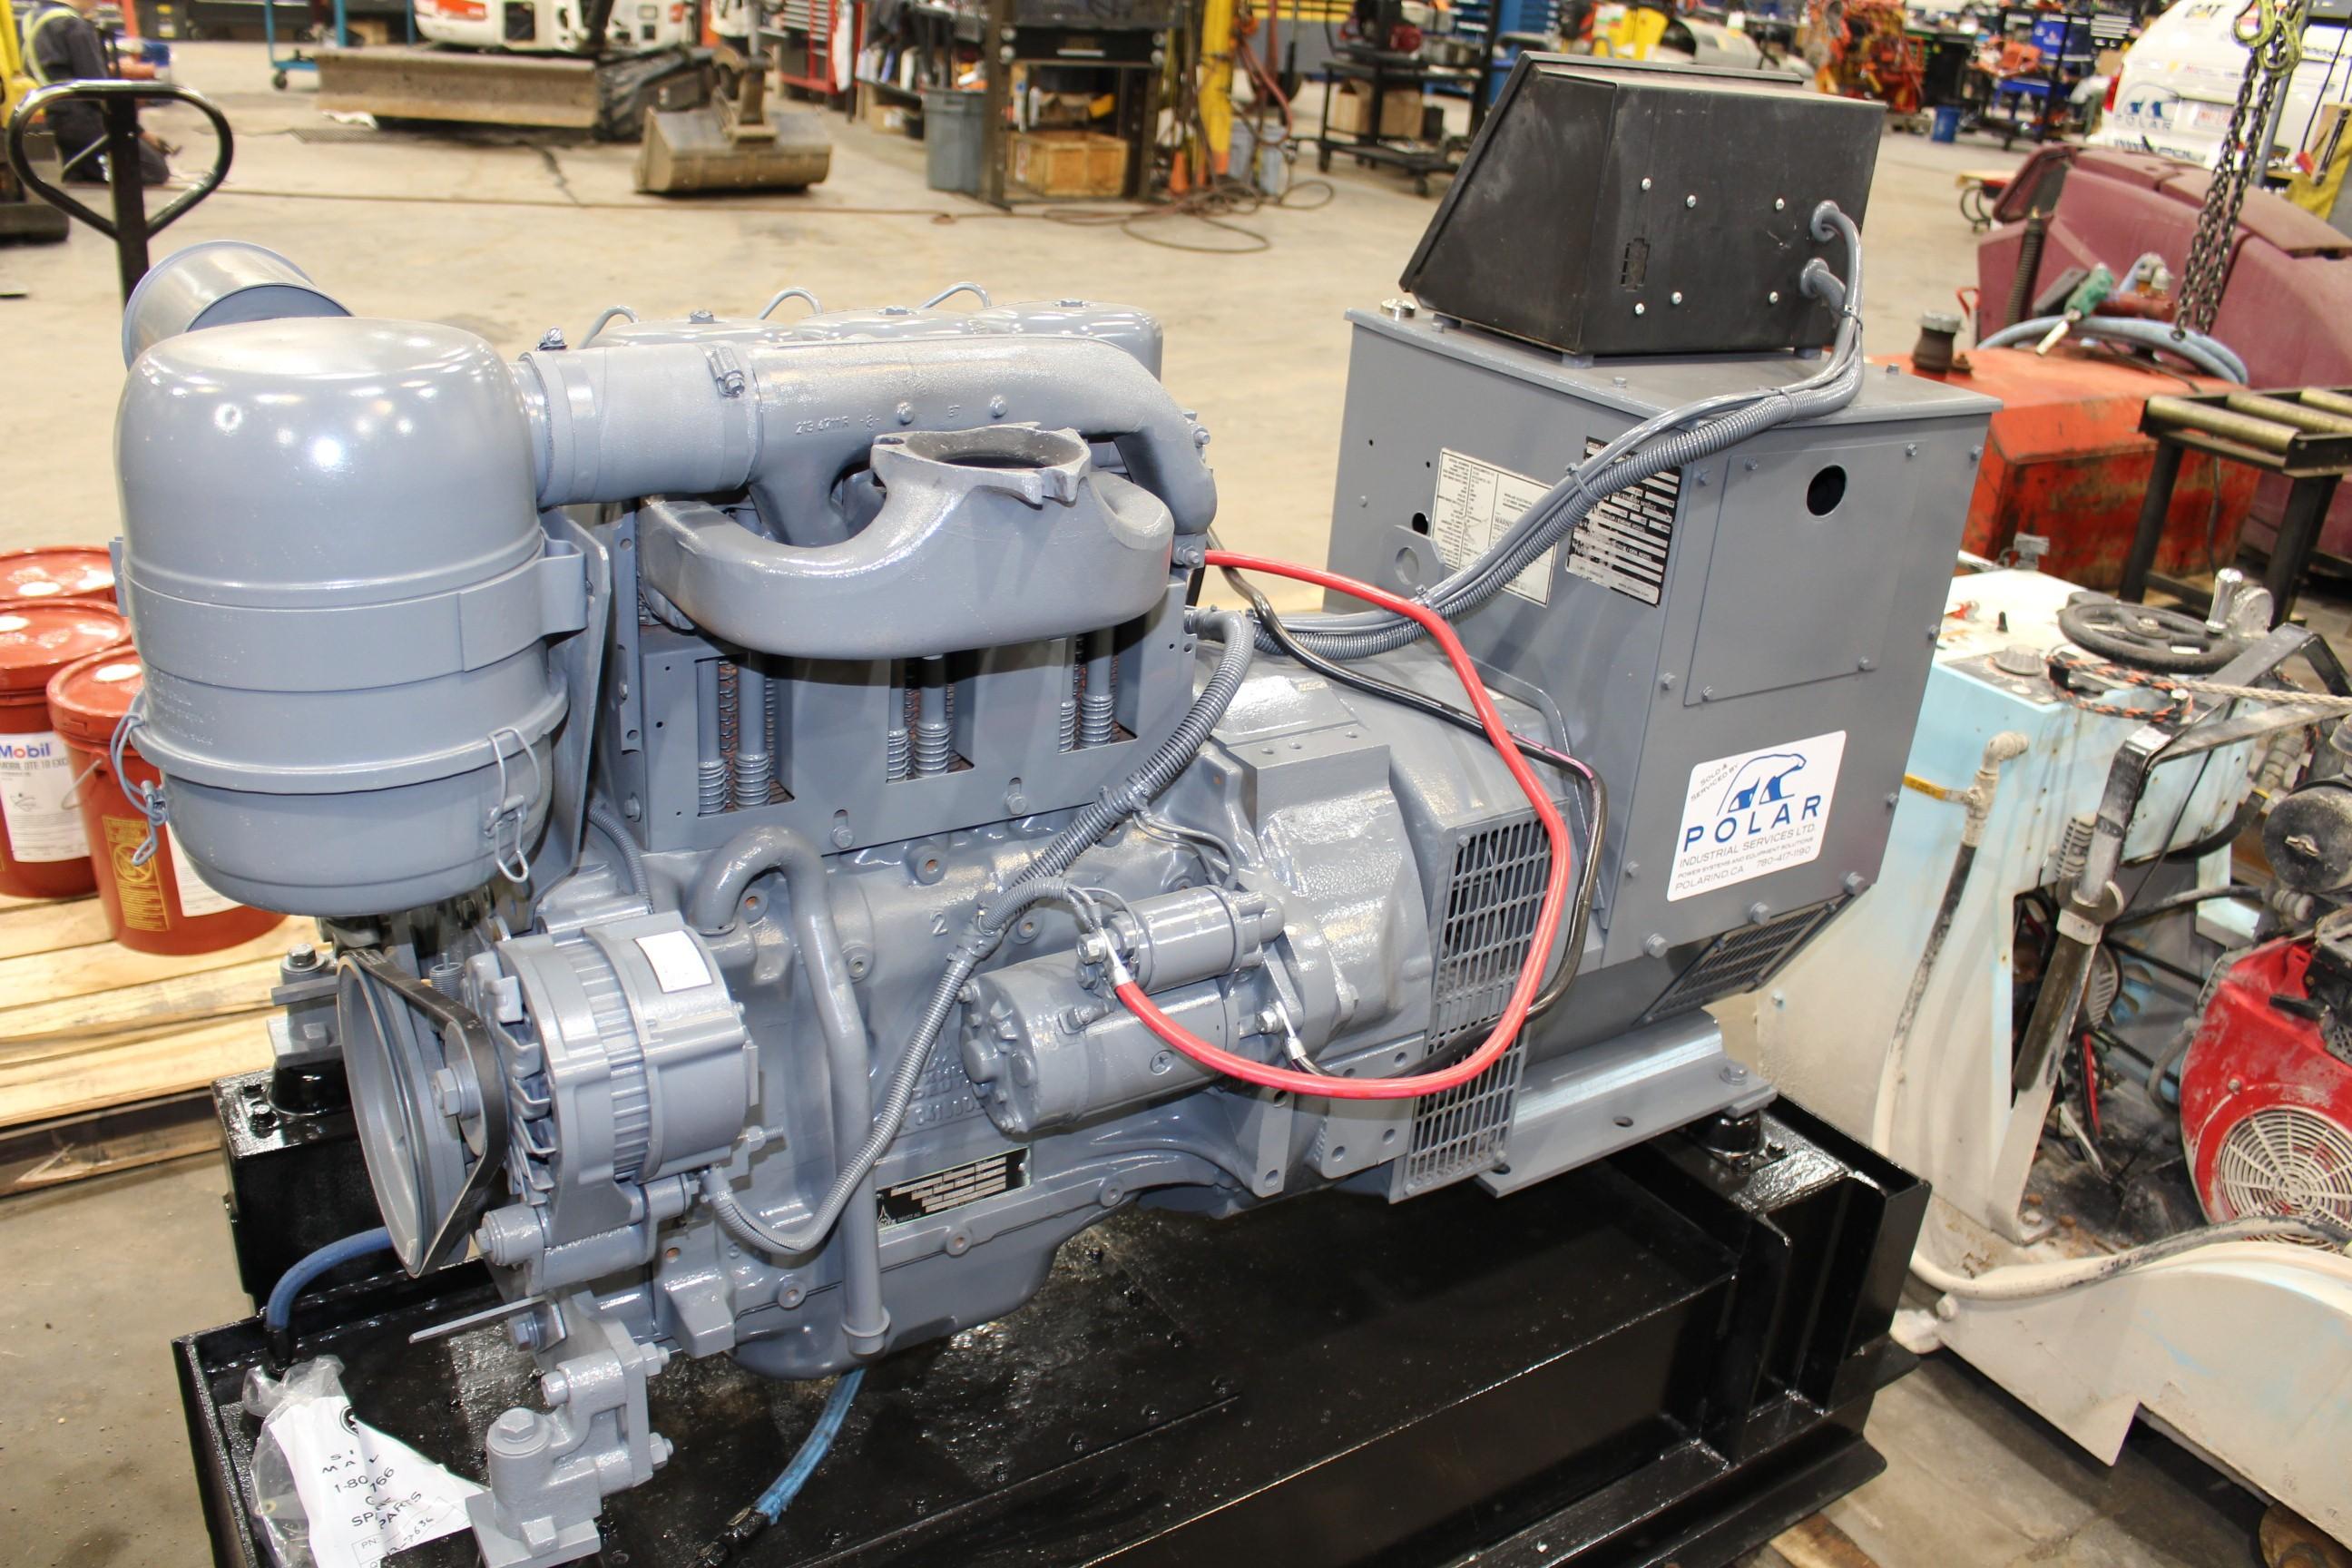 New 2018 Deutz 25Kw Generator in Edmonton, AB